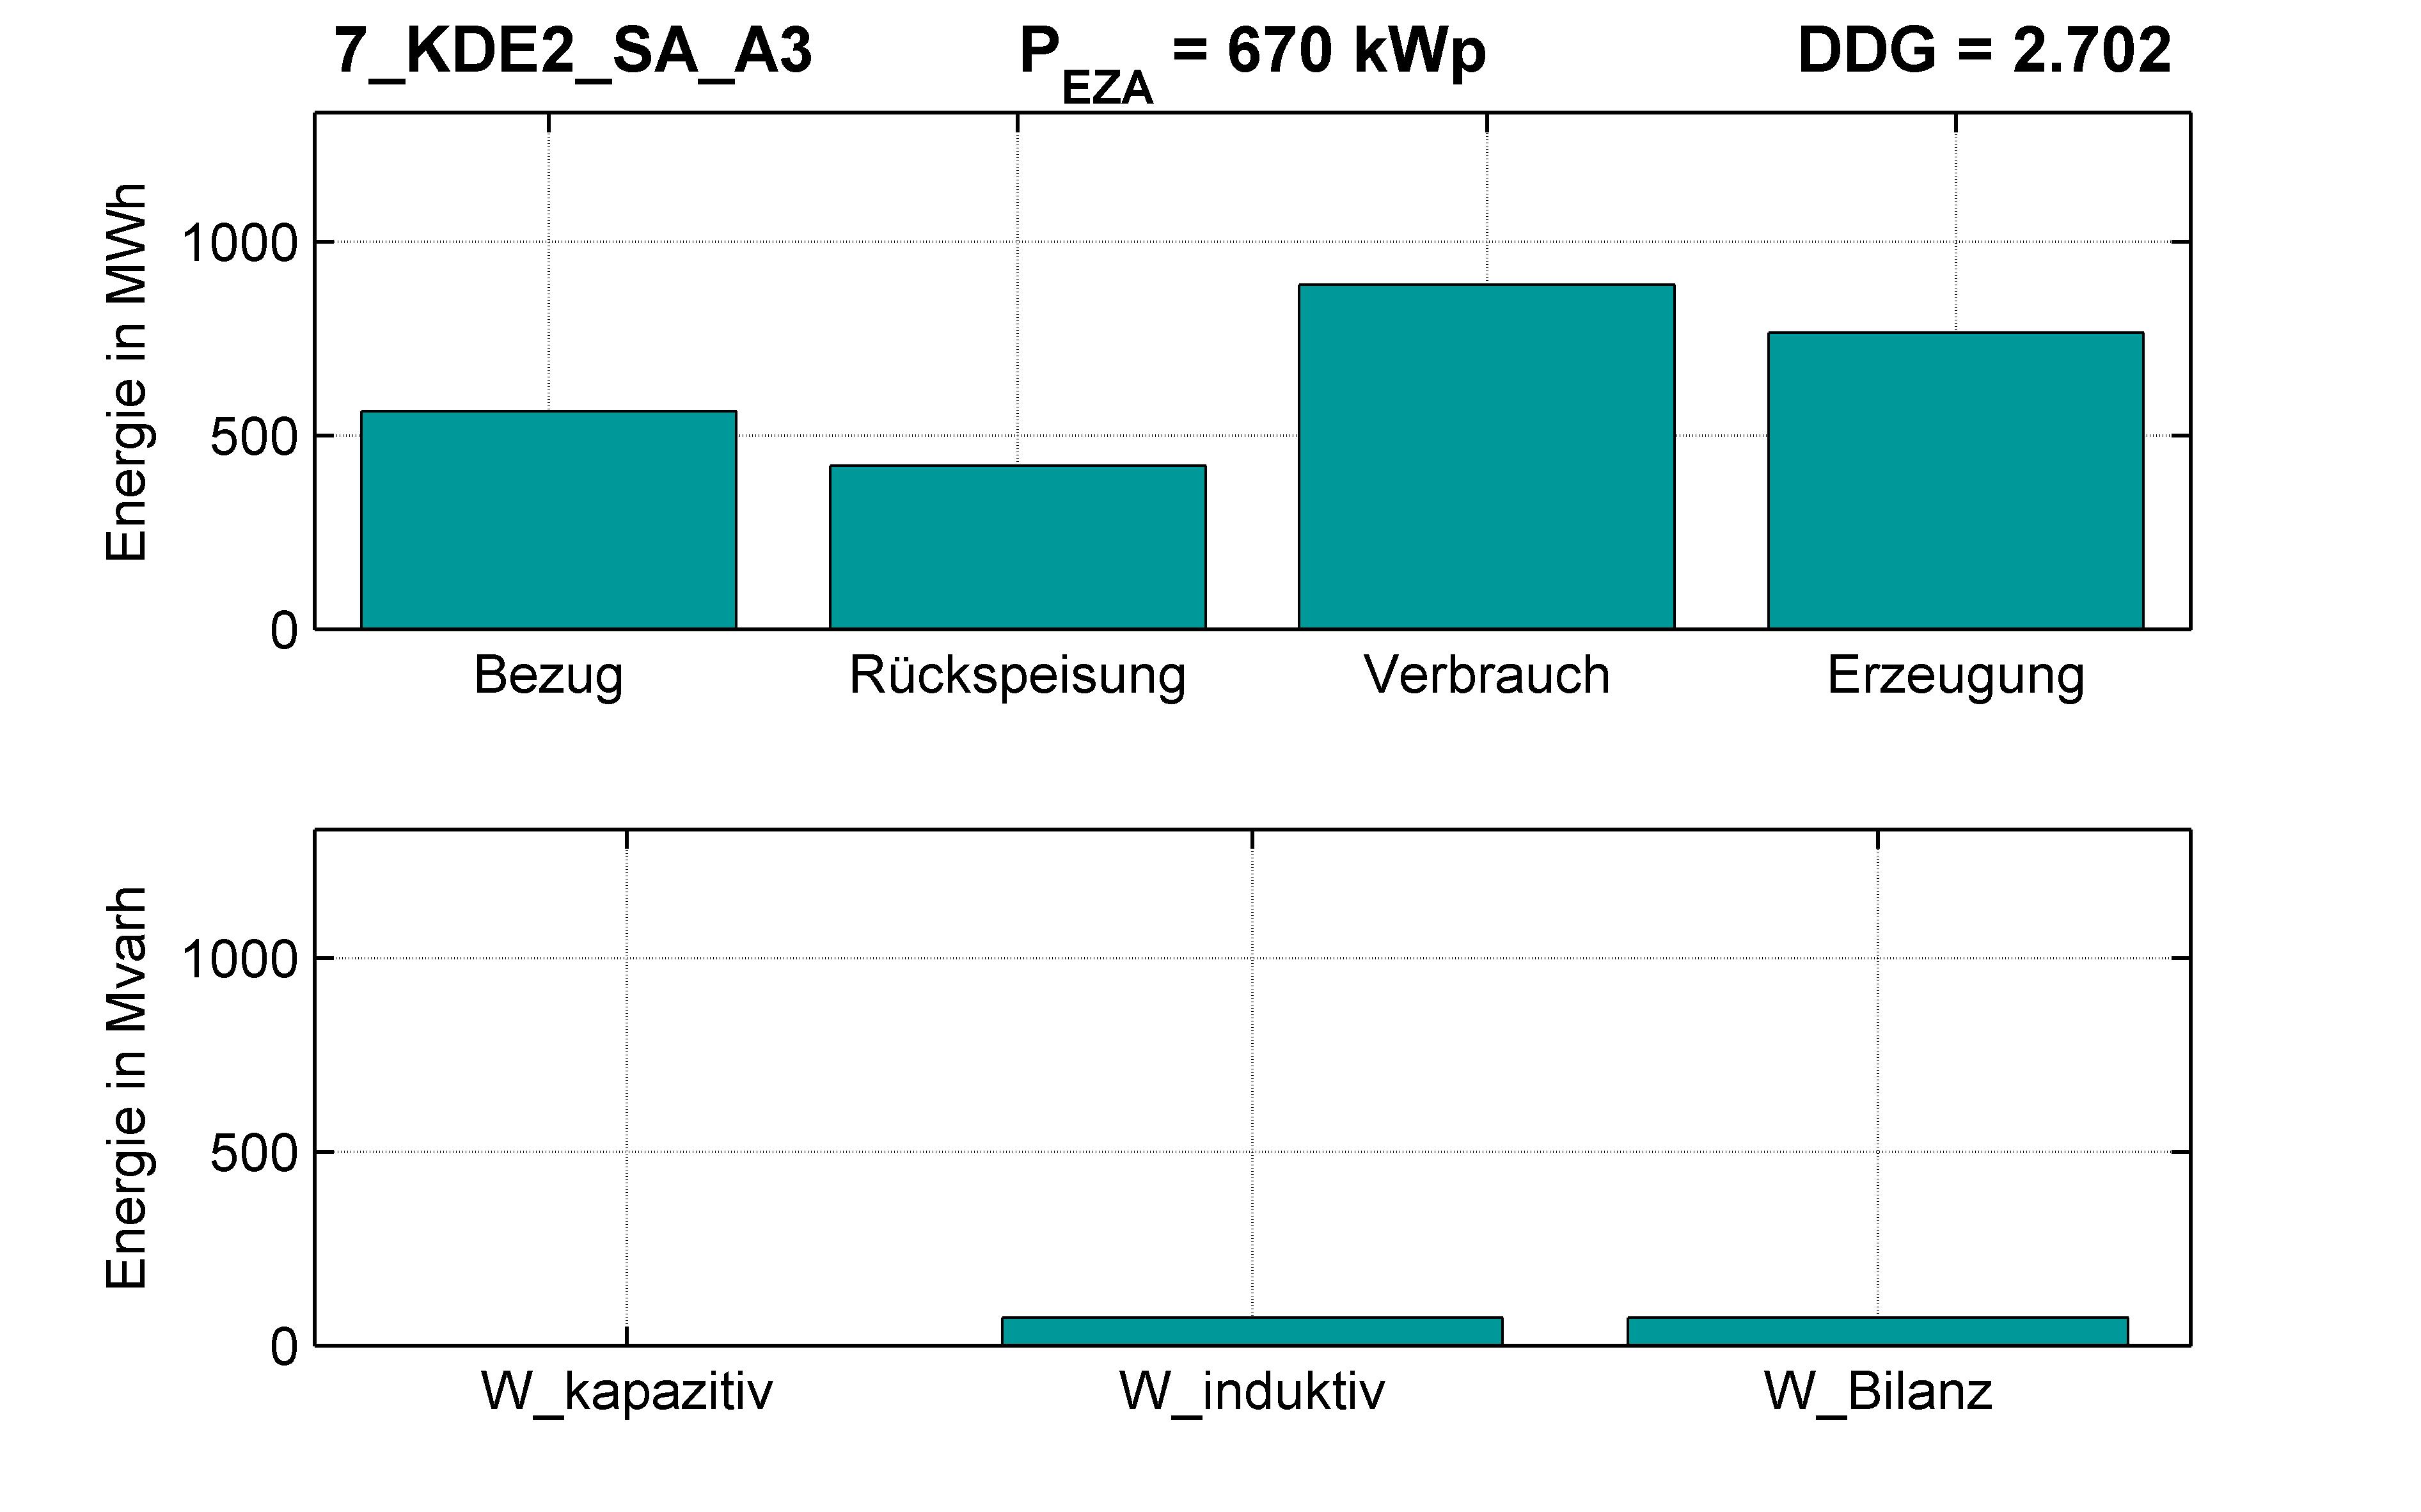 KDE2 | Längsregler (SA) A3 | PQ-Bilanz